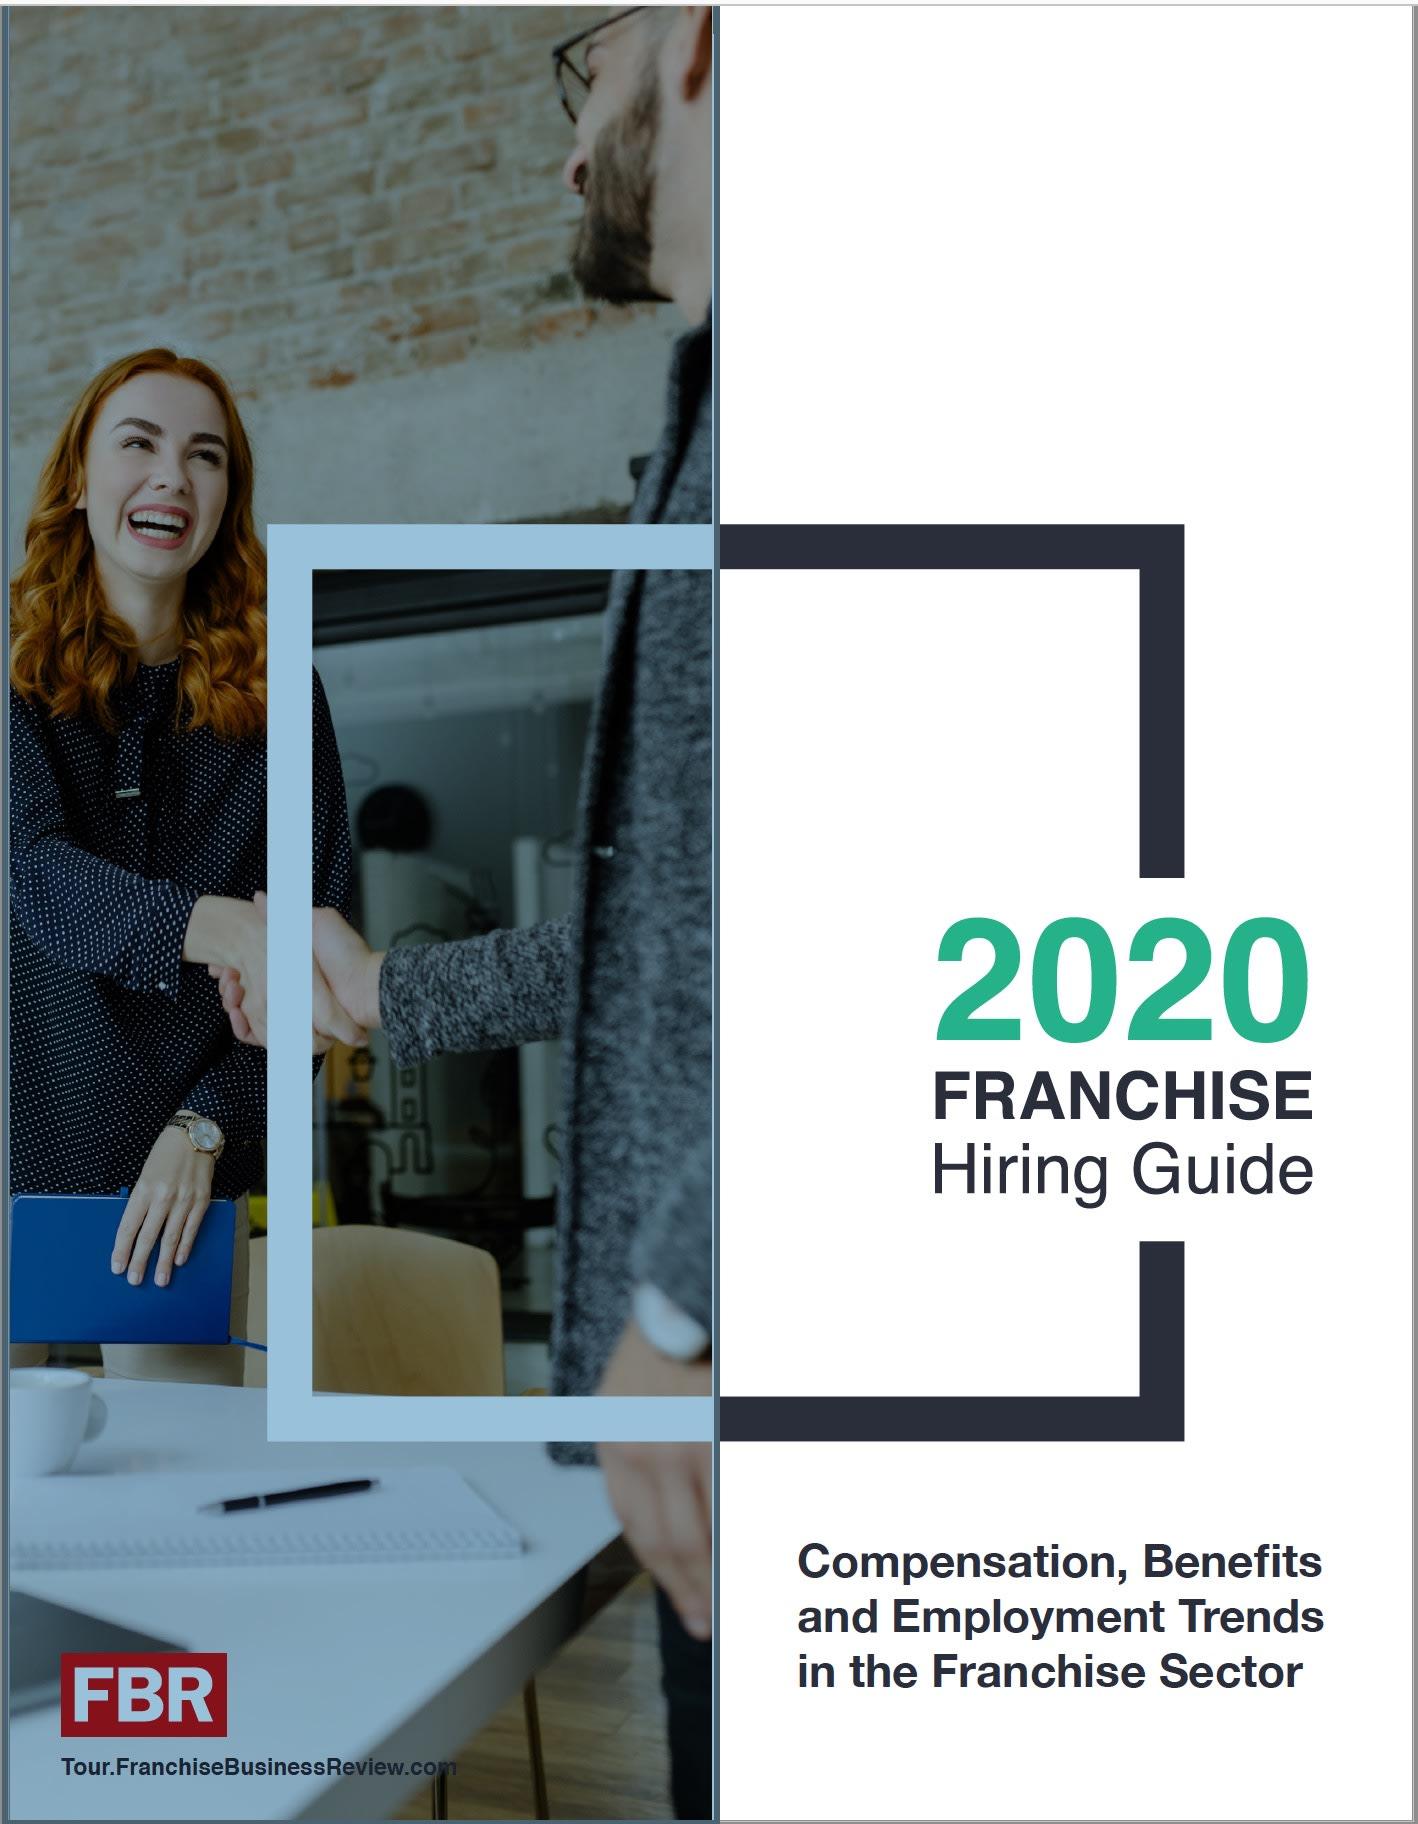 FBR+Franchise+Hiring+Guide